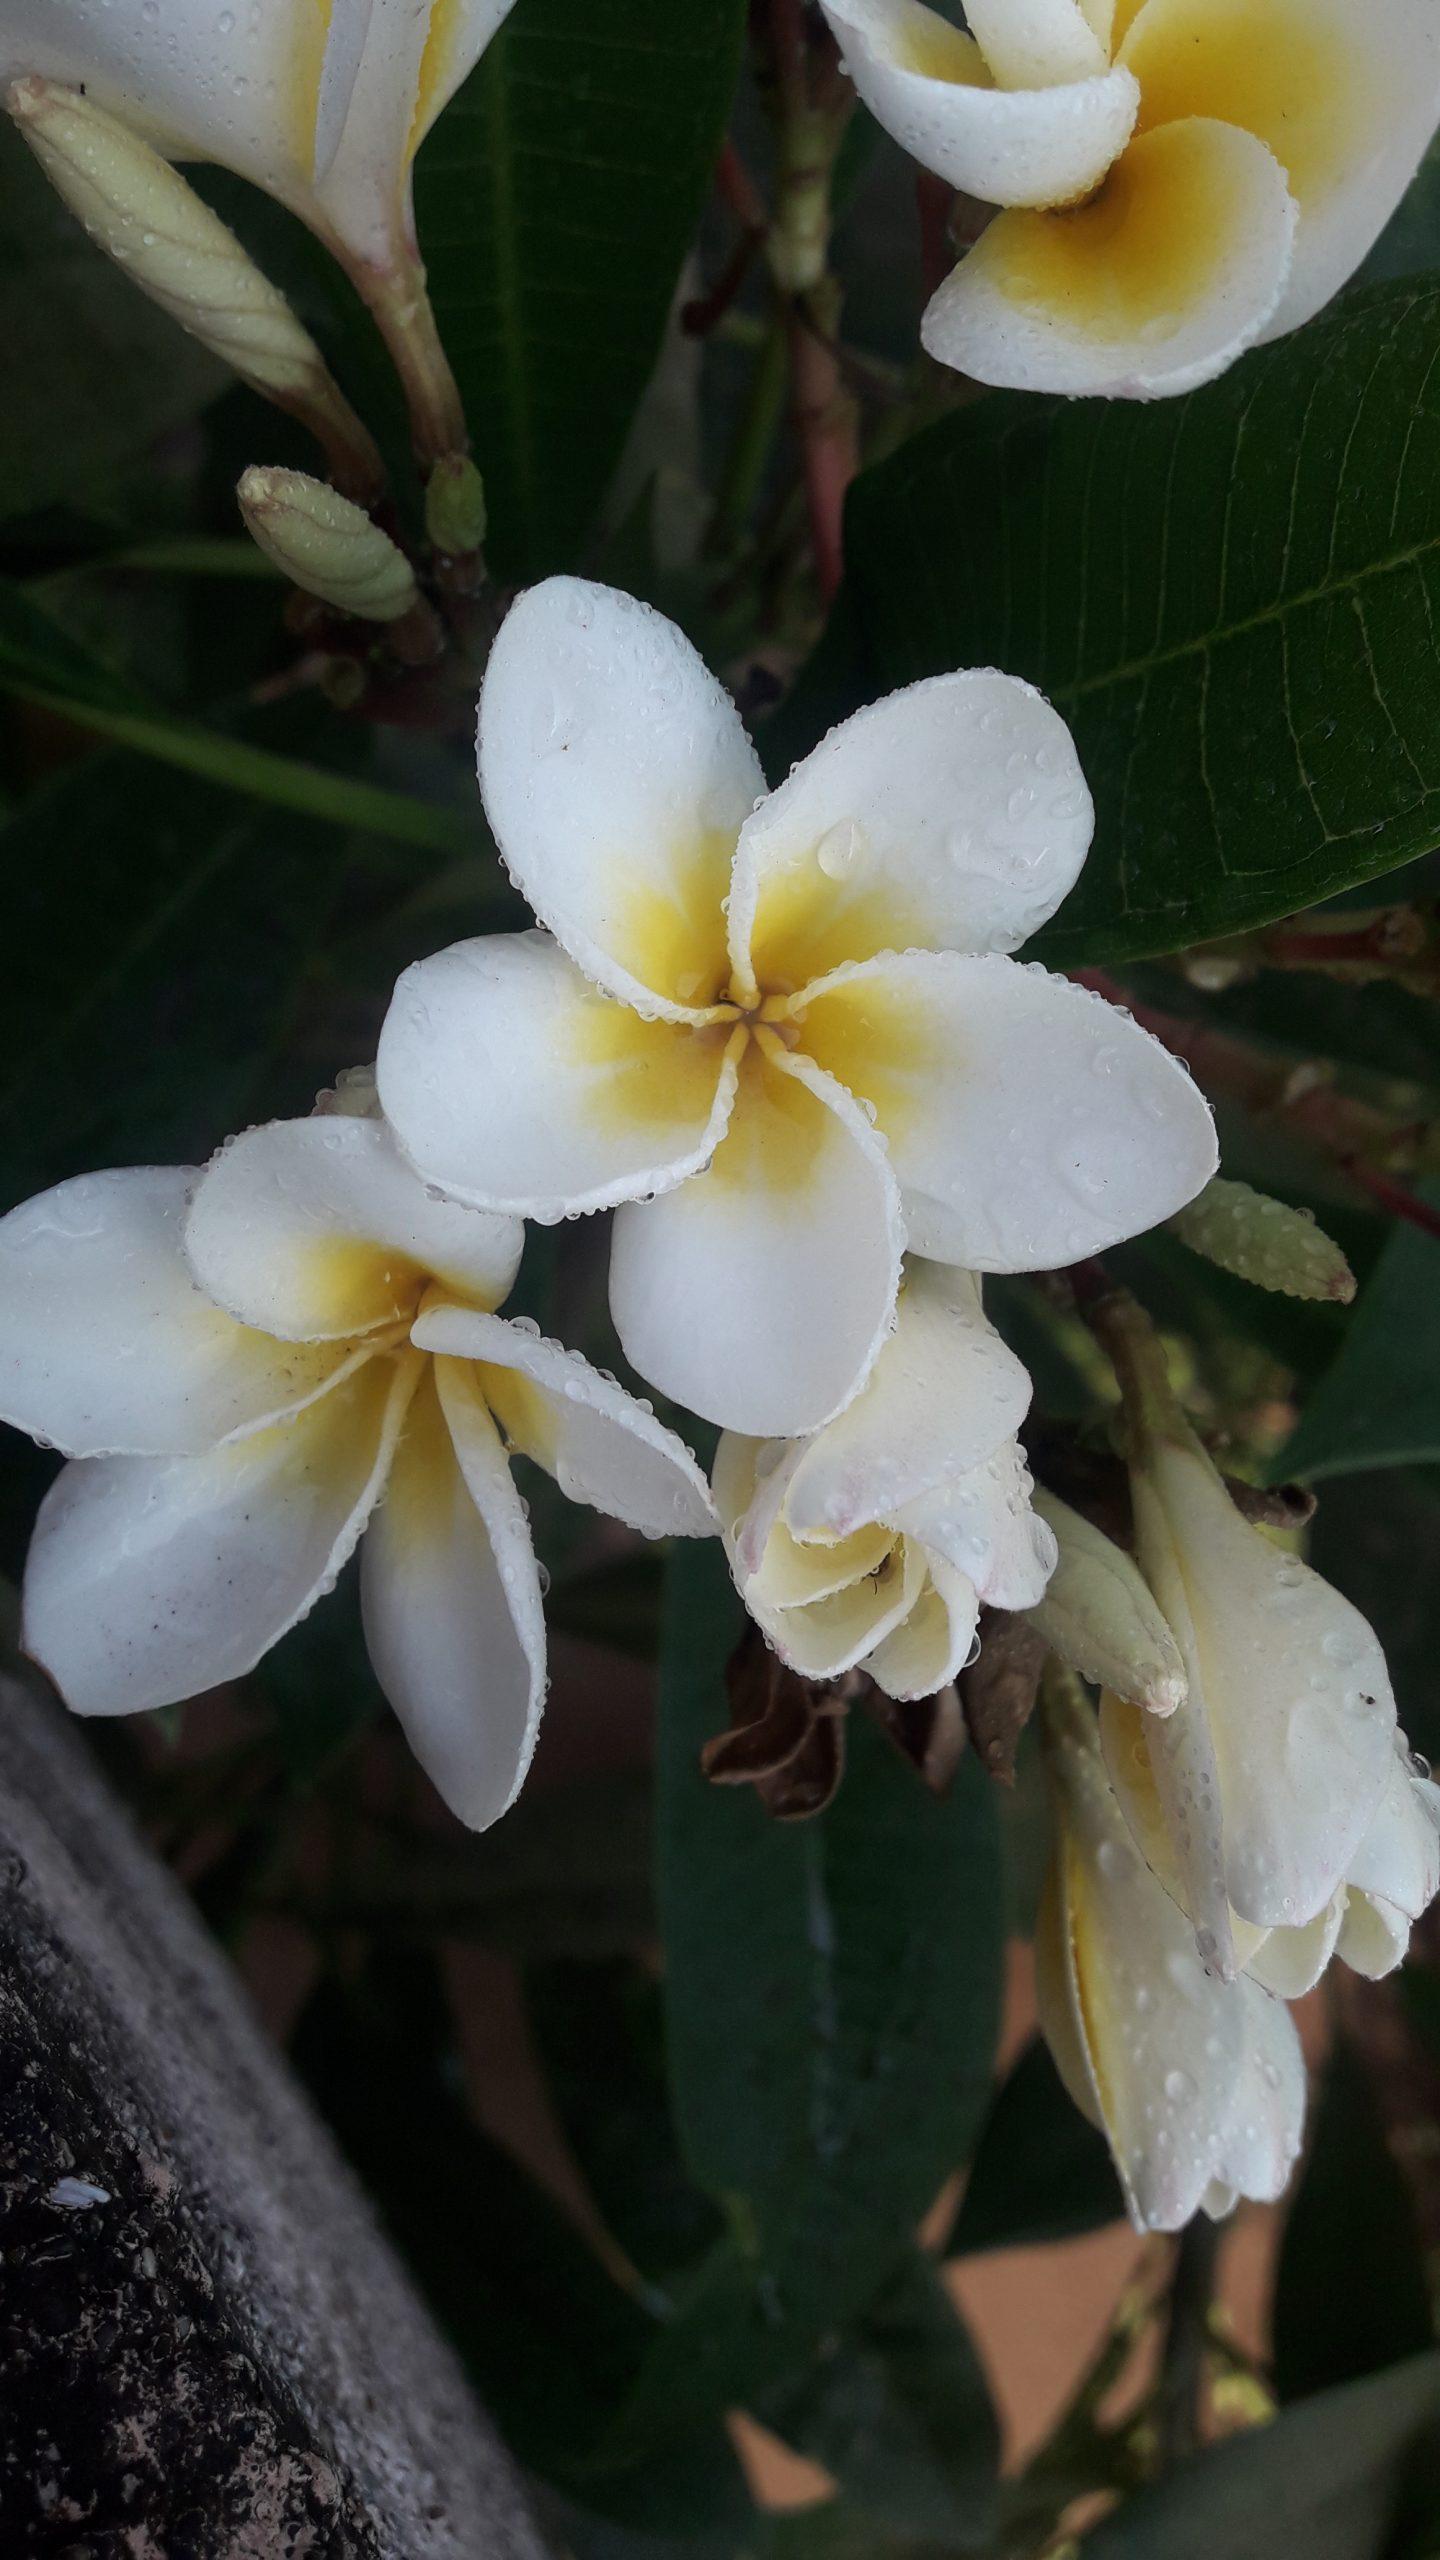 Champa plant flowers